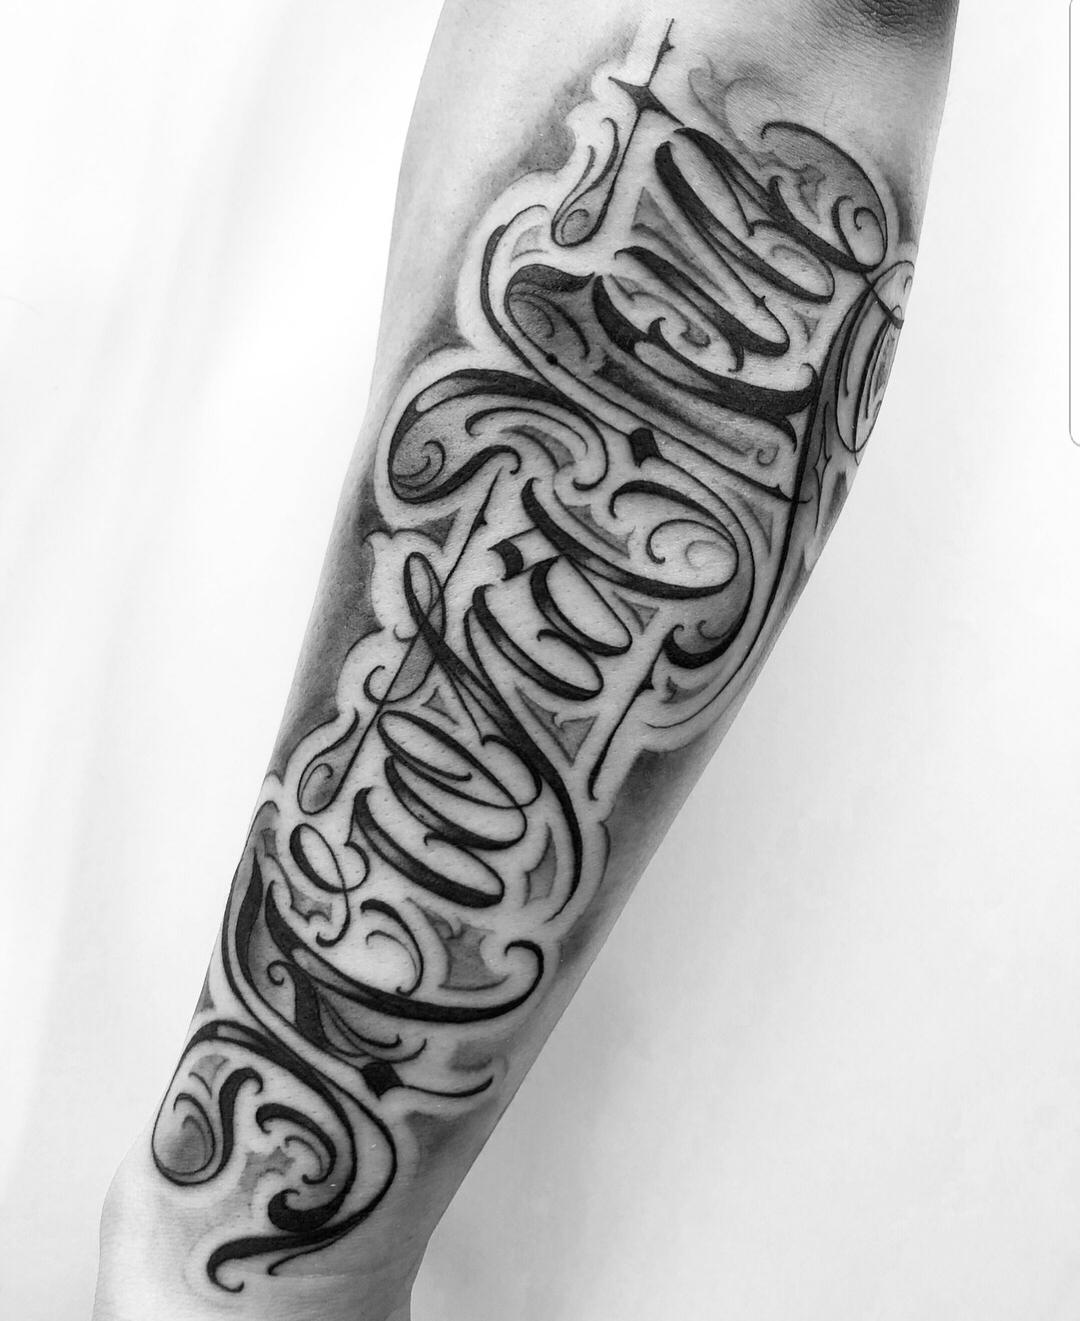 Jaw Line Tattoos: Lettering Tattoos